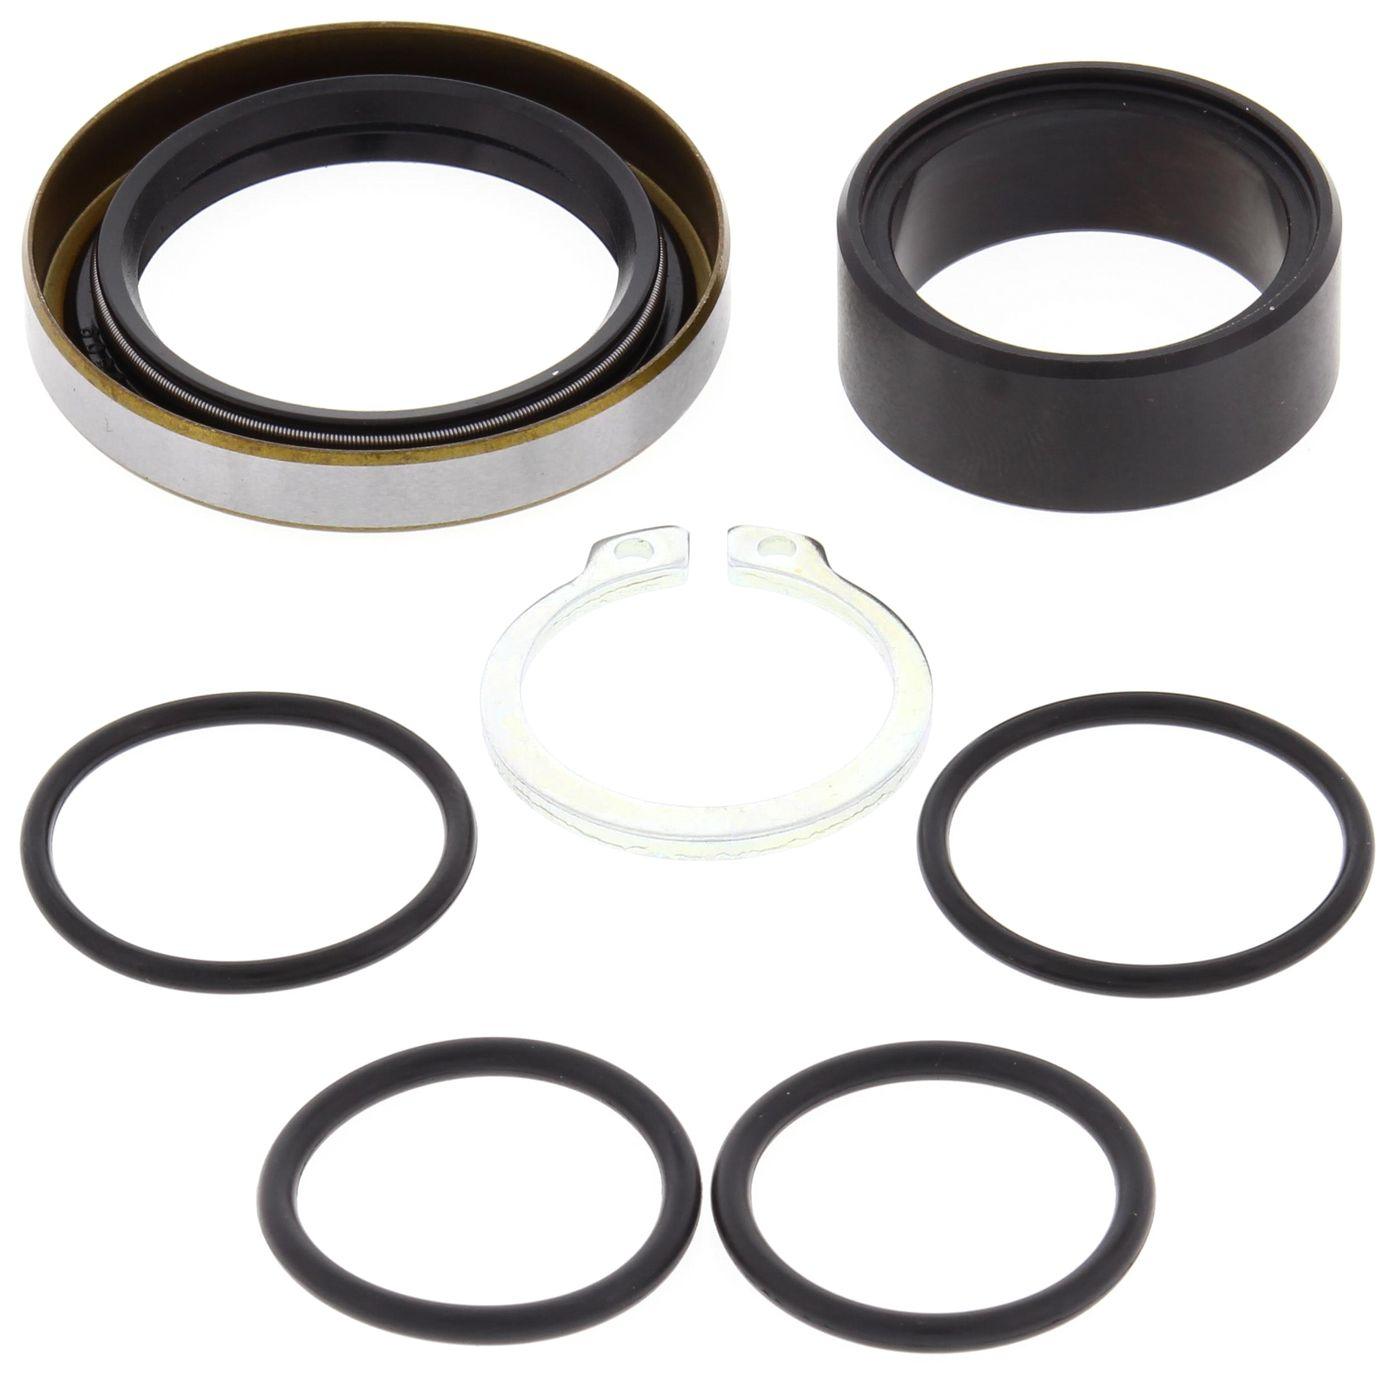 Wrp Drive Shaft Seal Kits - WRP254001 image